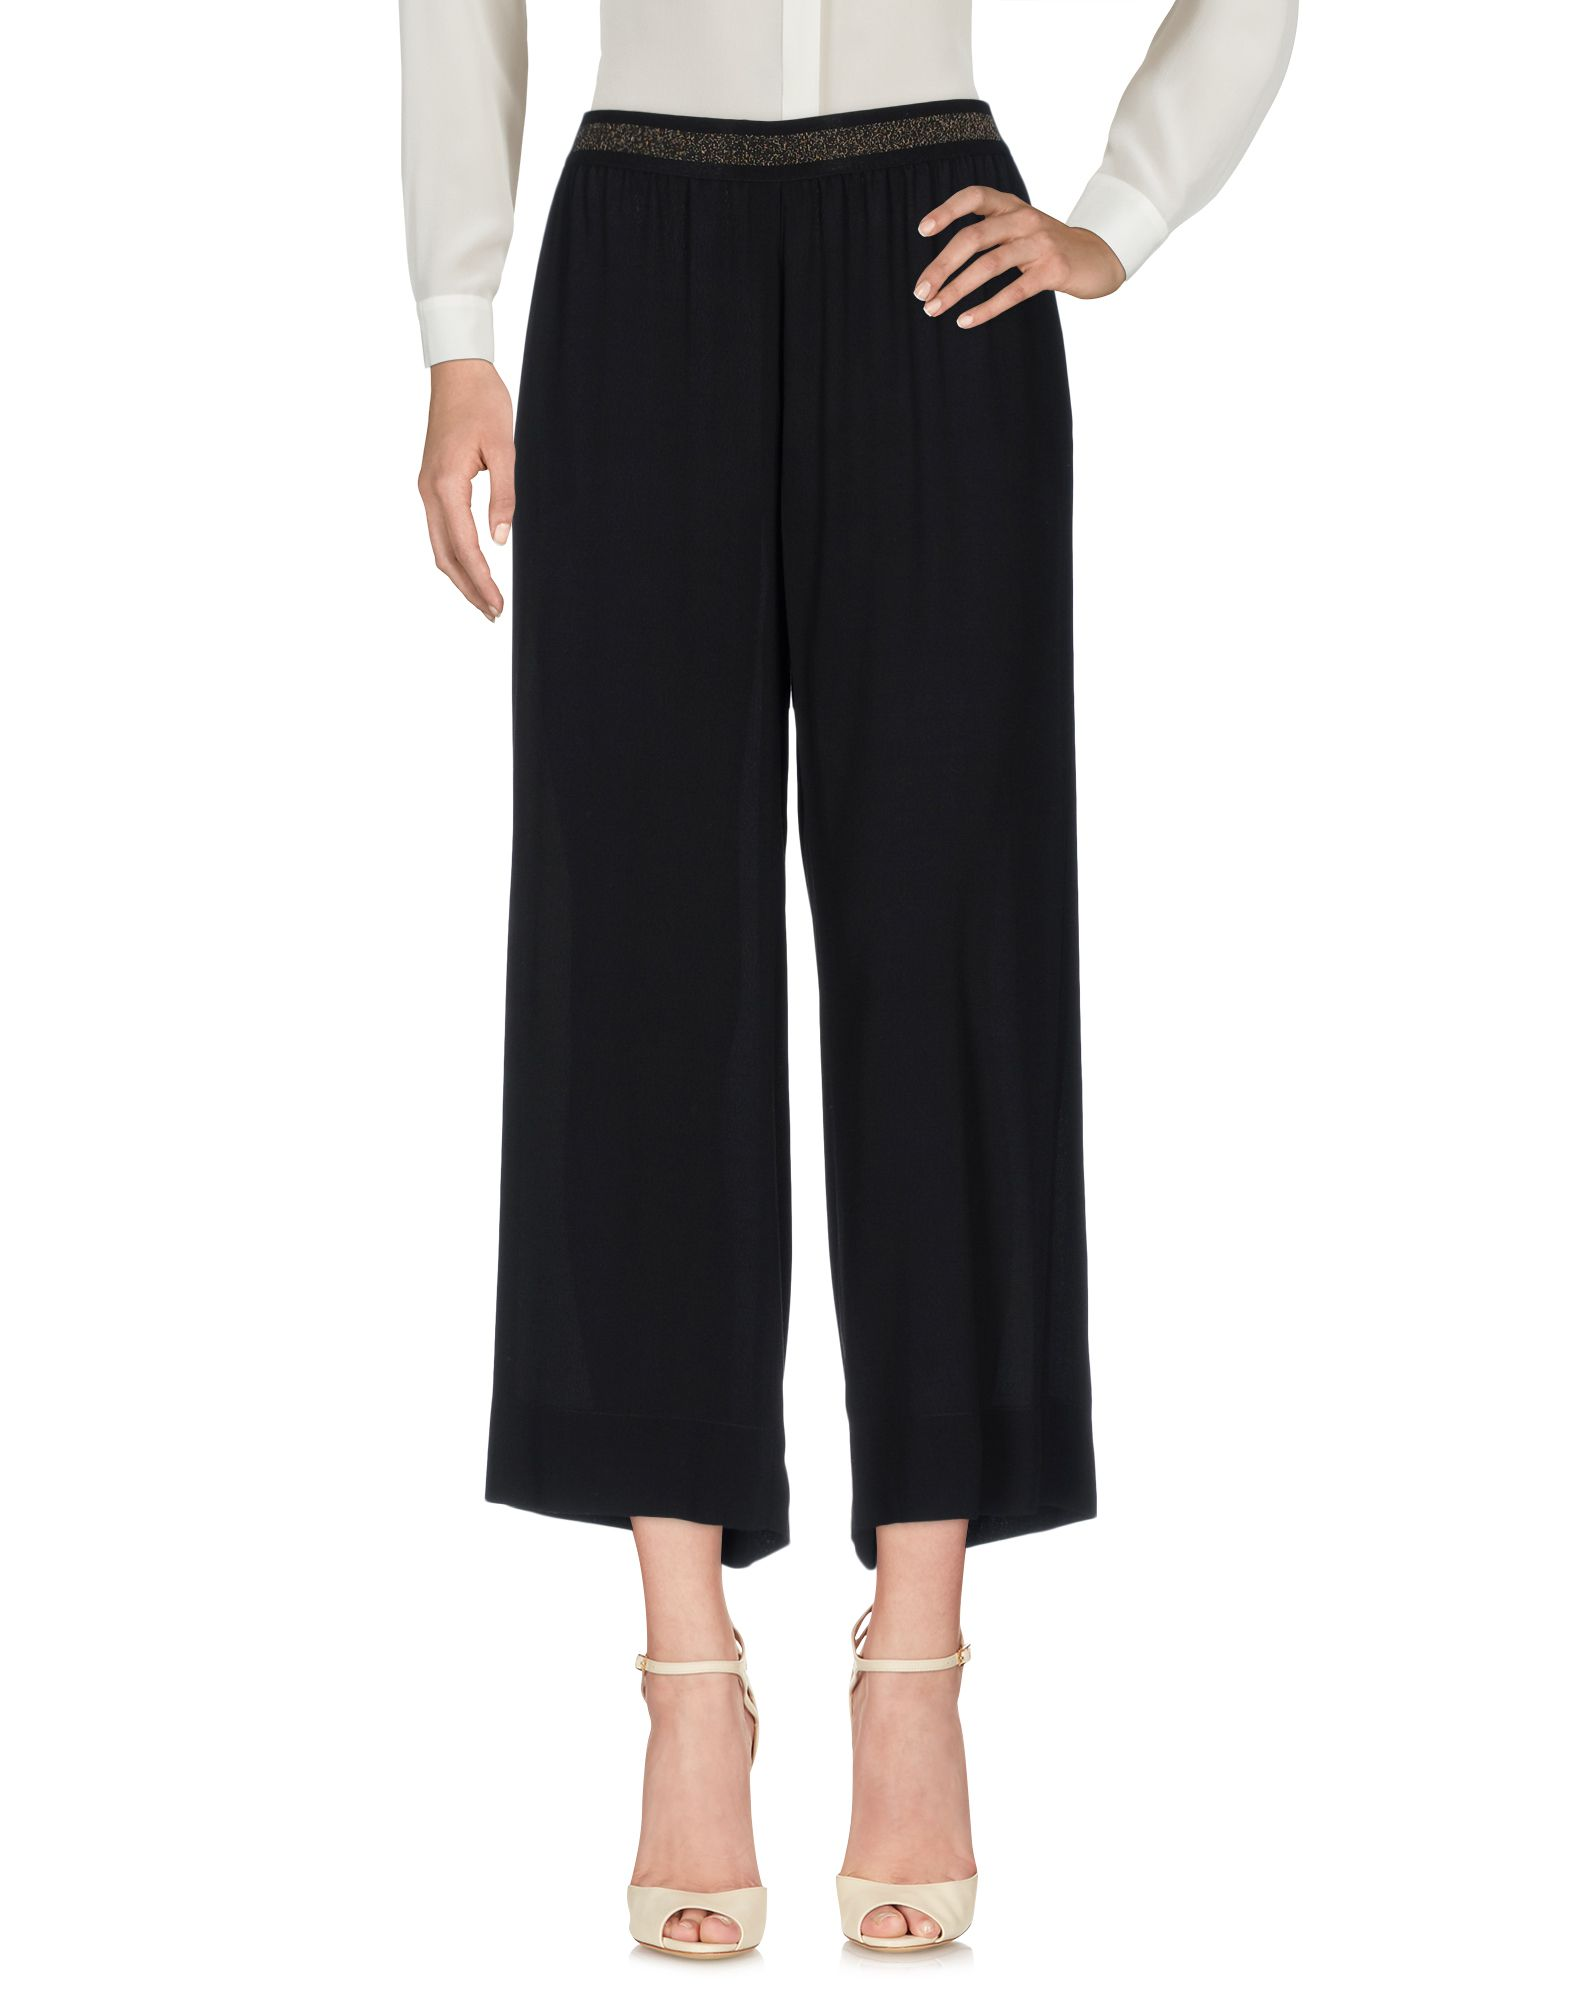 Pantalone Just Cavalli Donna - Acquista online su zlZia